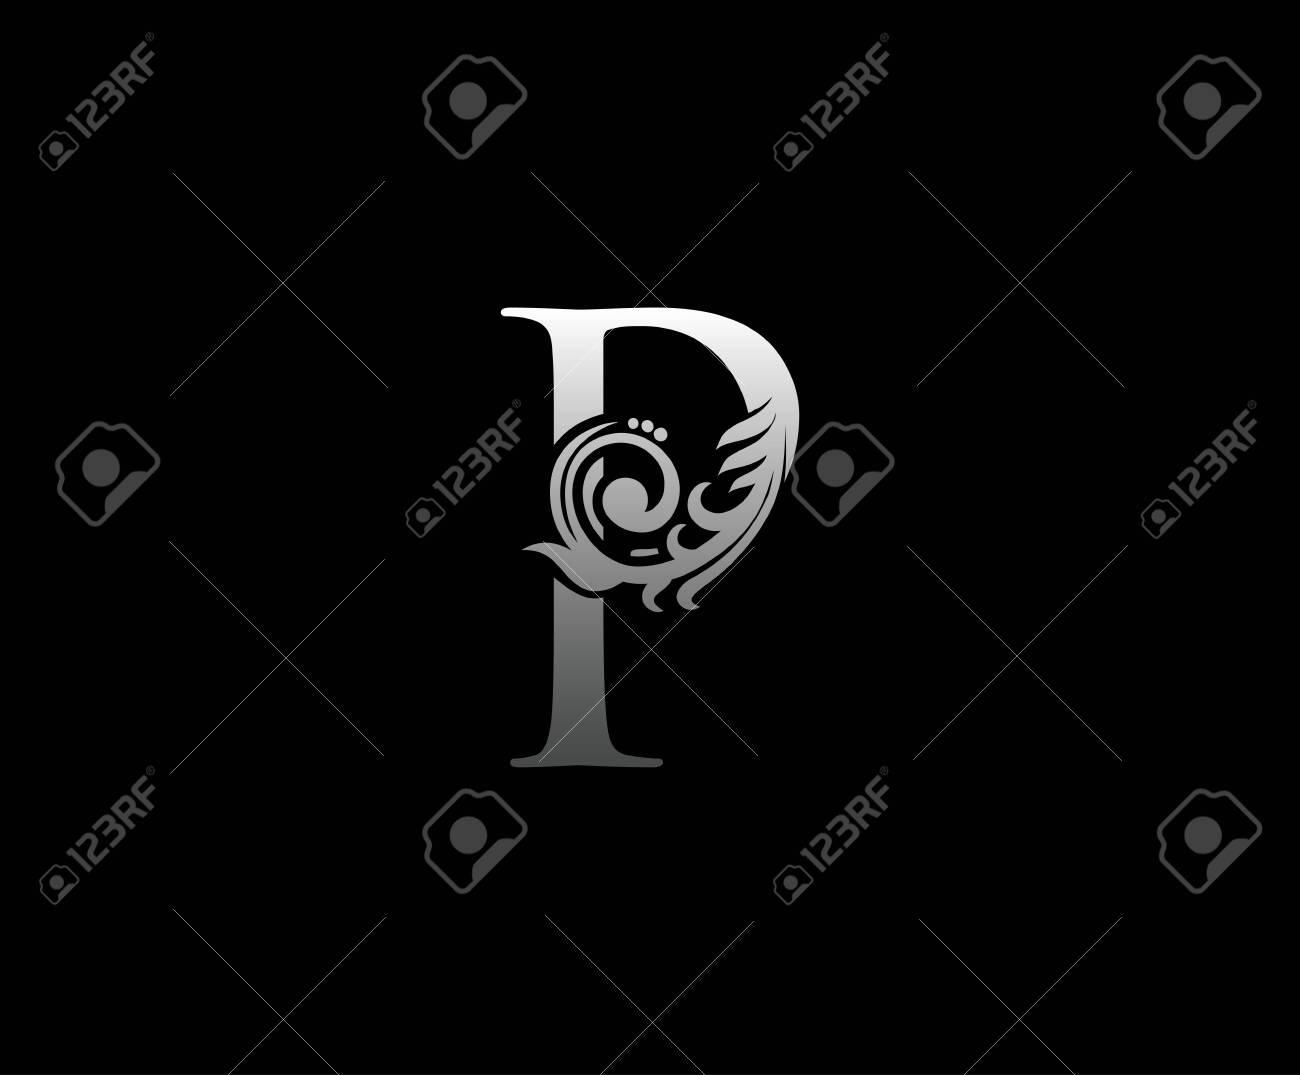 Silver P letter luxury beauty flourishes monogram logo - 143041075